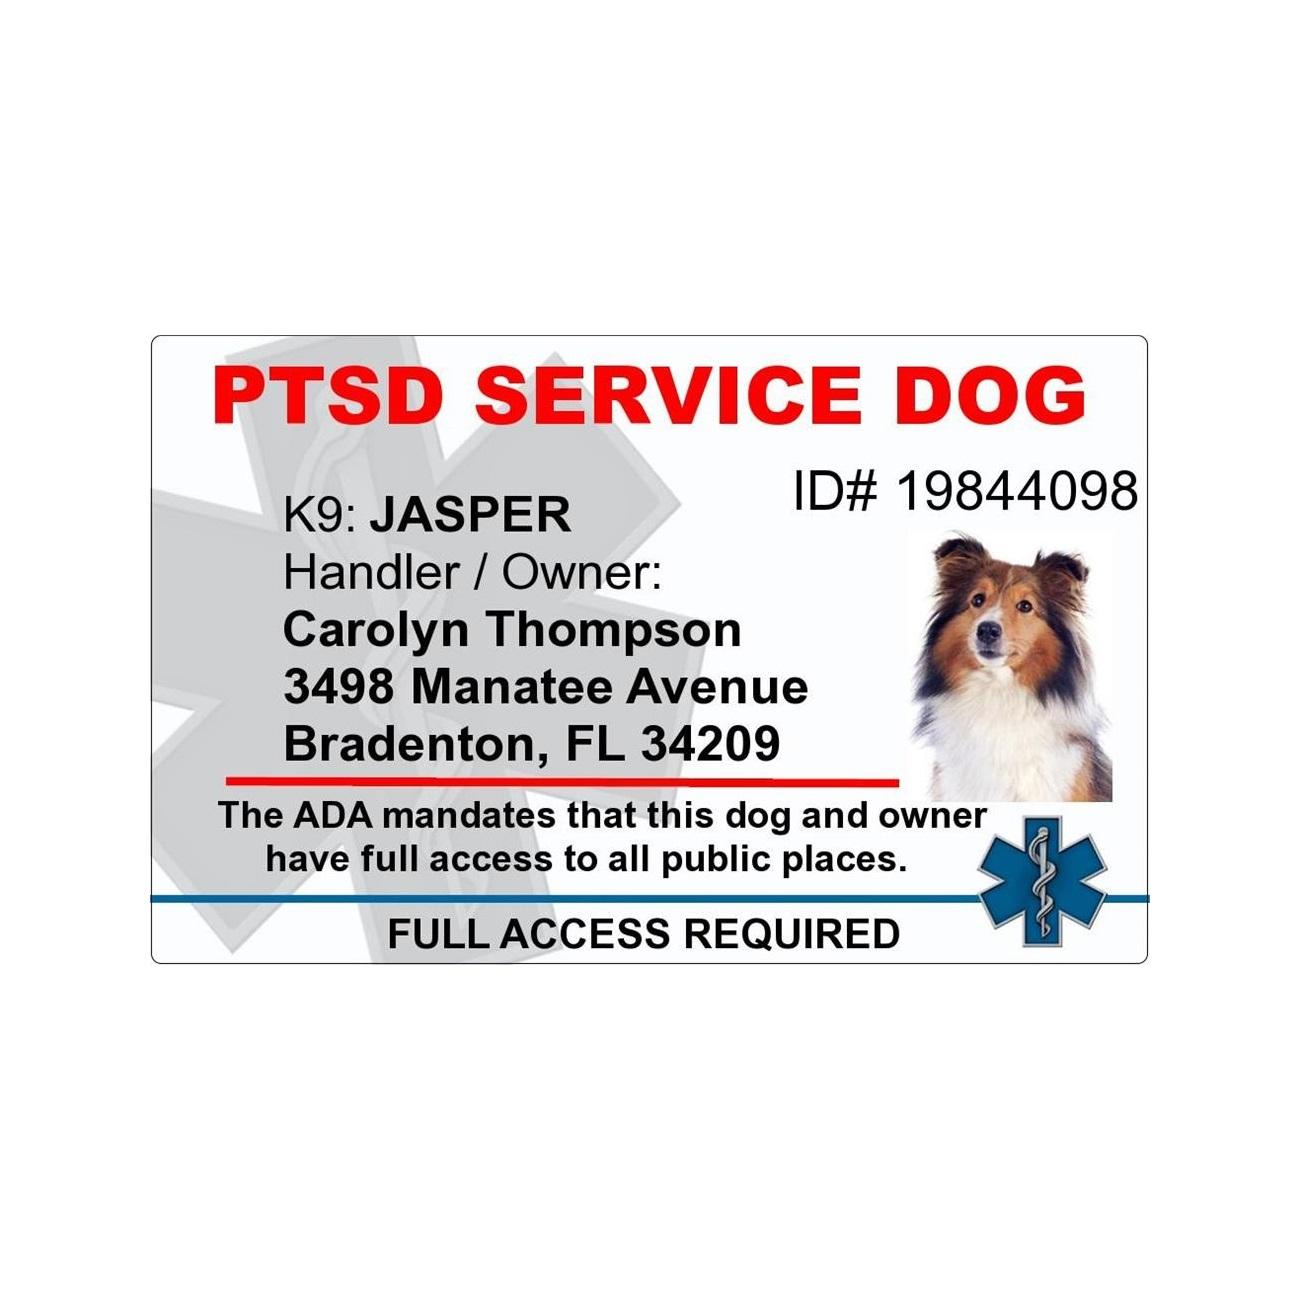 8f7194894ae7 PTSD Service Dog PVC ID Badge - 2 Sided - Star of Life